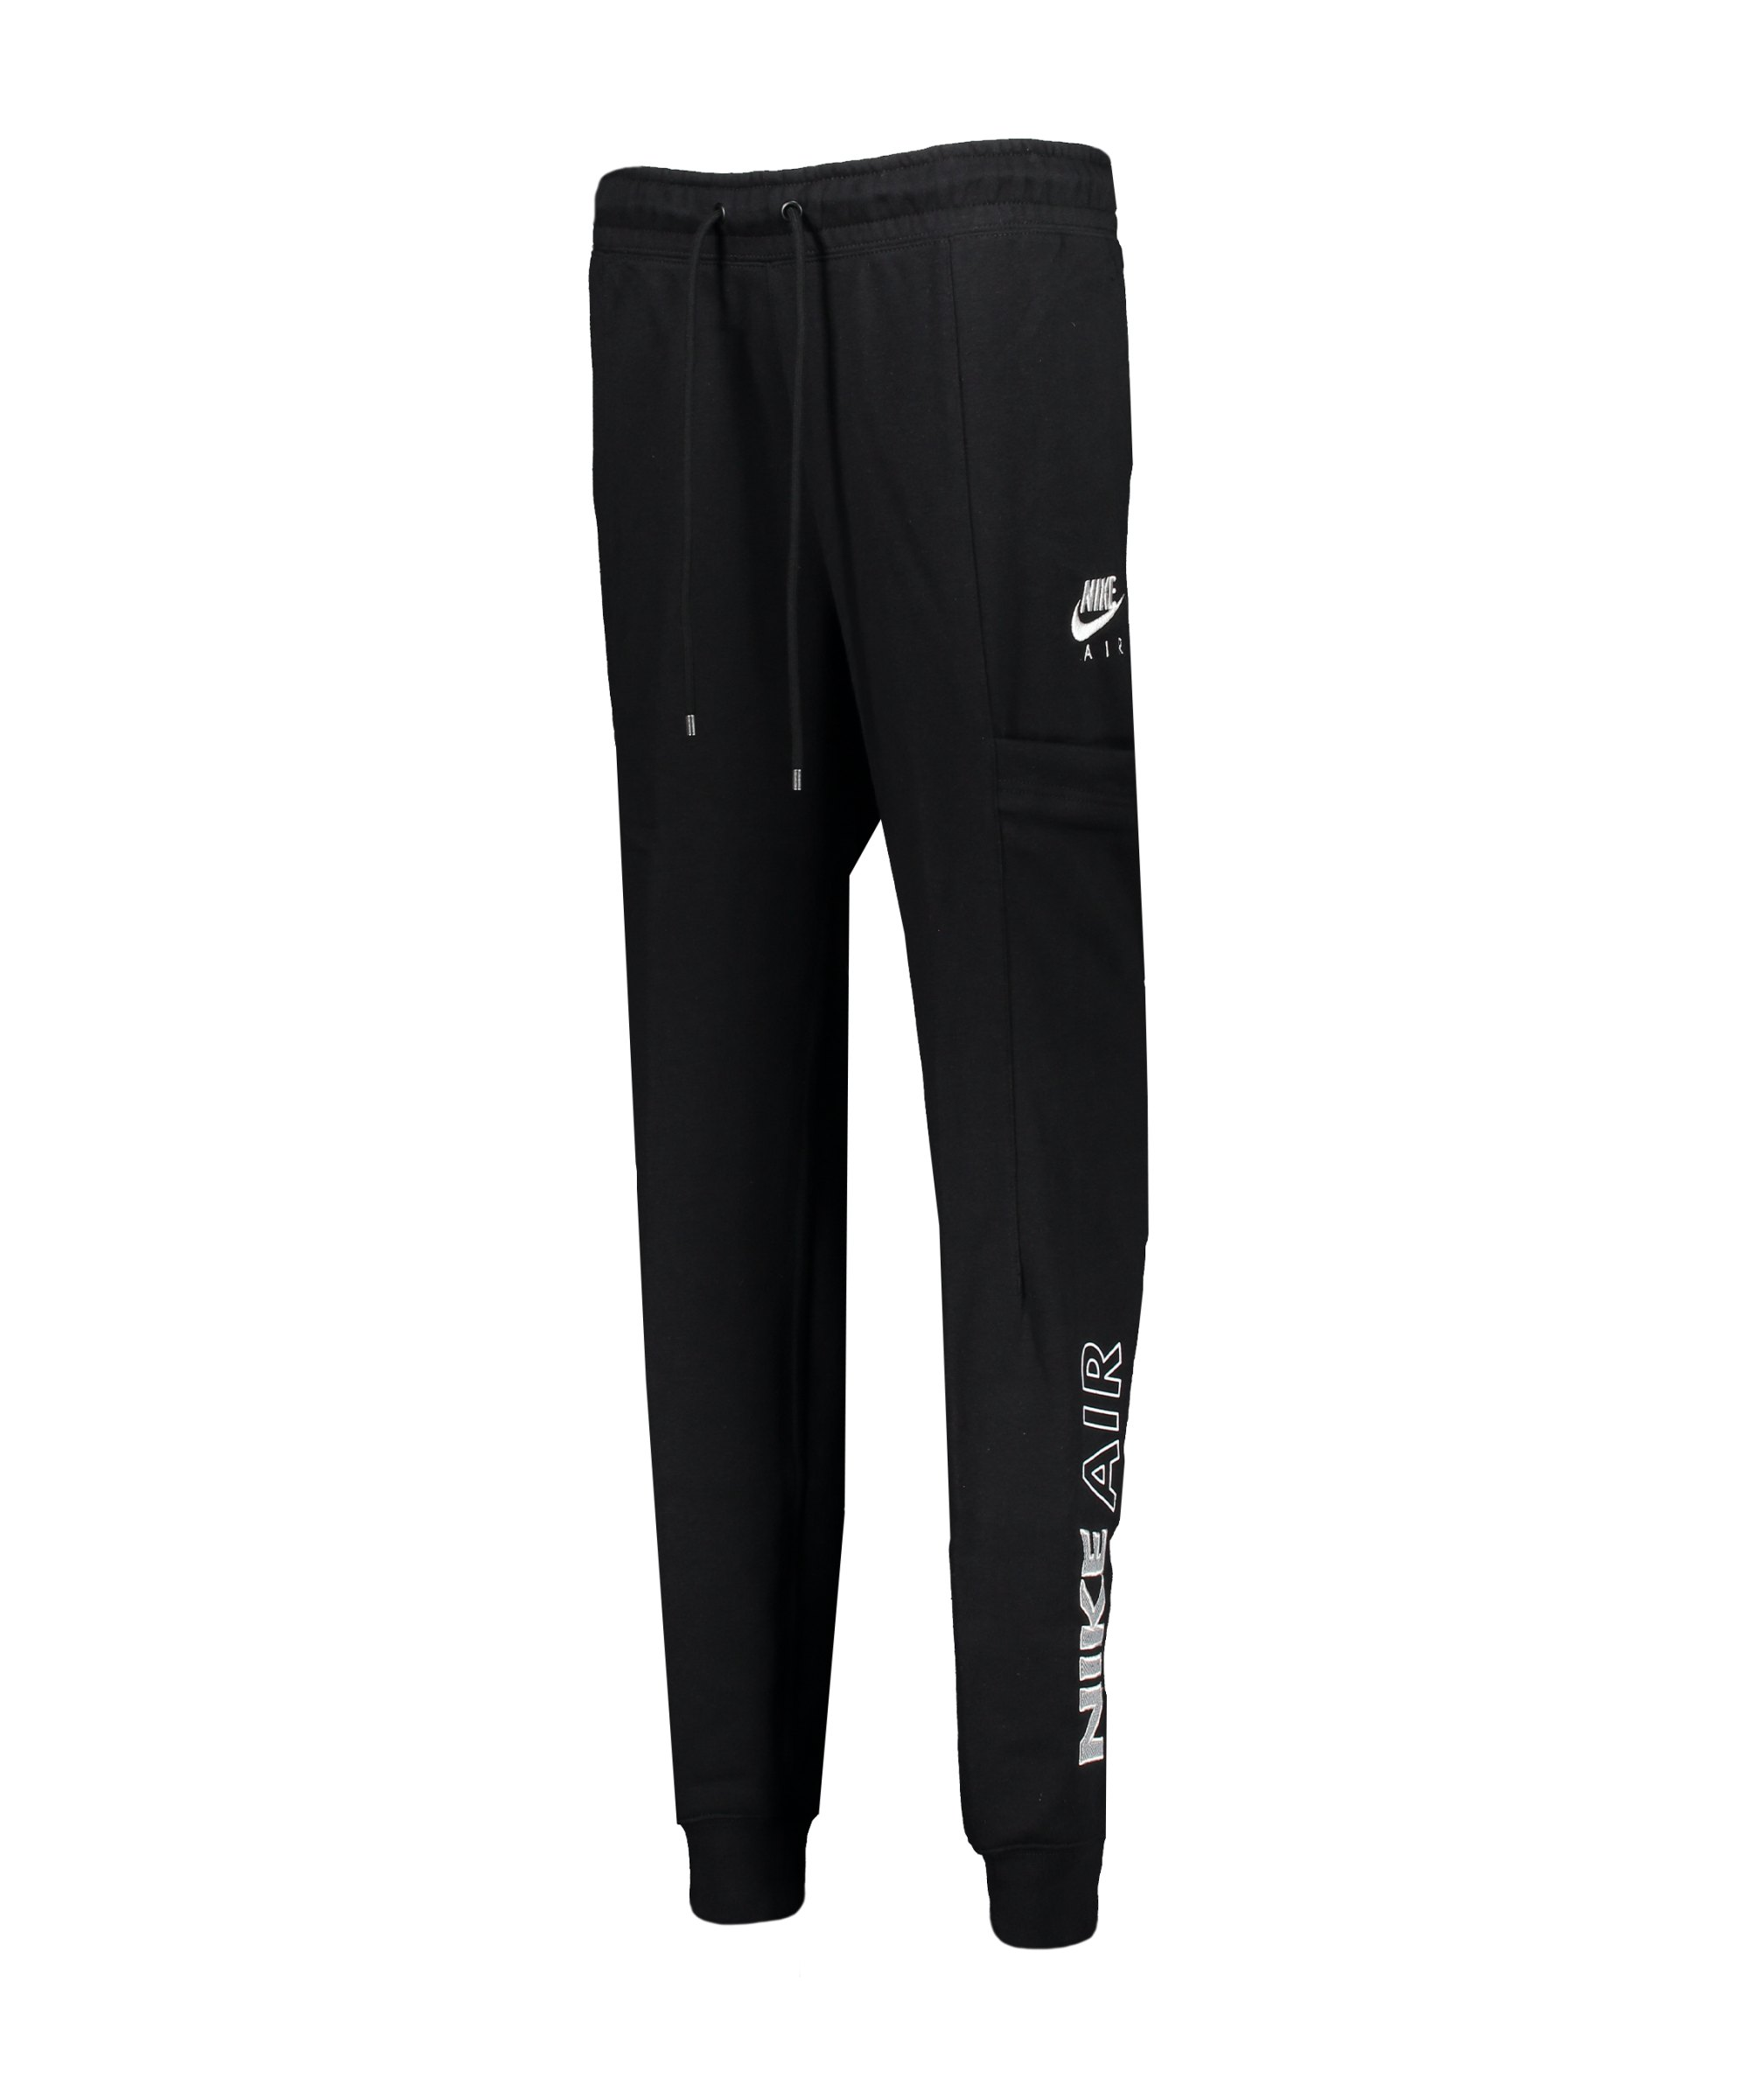 Nike Air Jogginghose Damen Schwarz Weiss F010 - schwarz